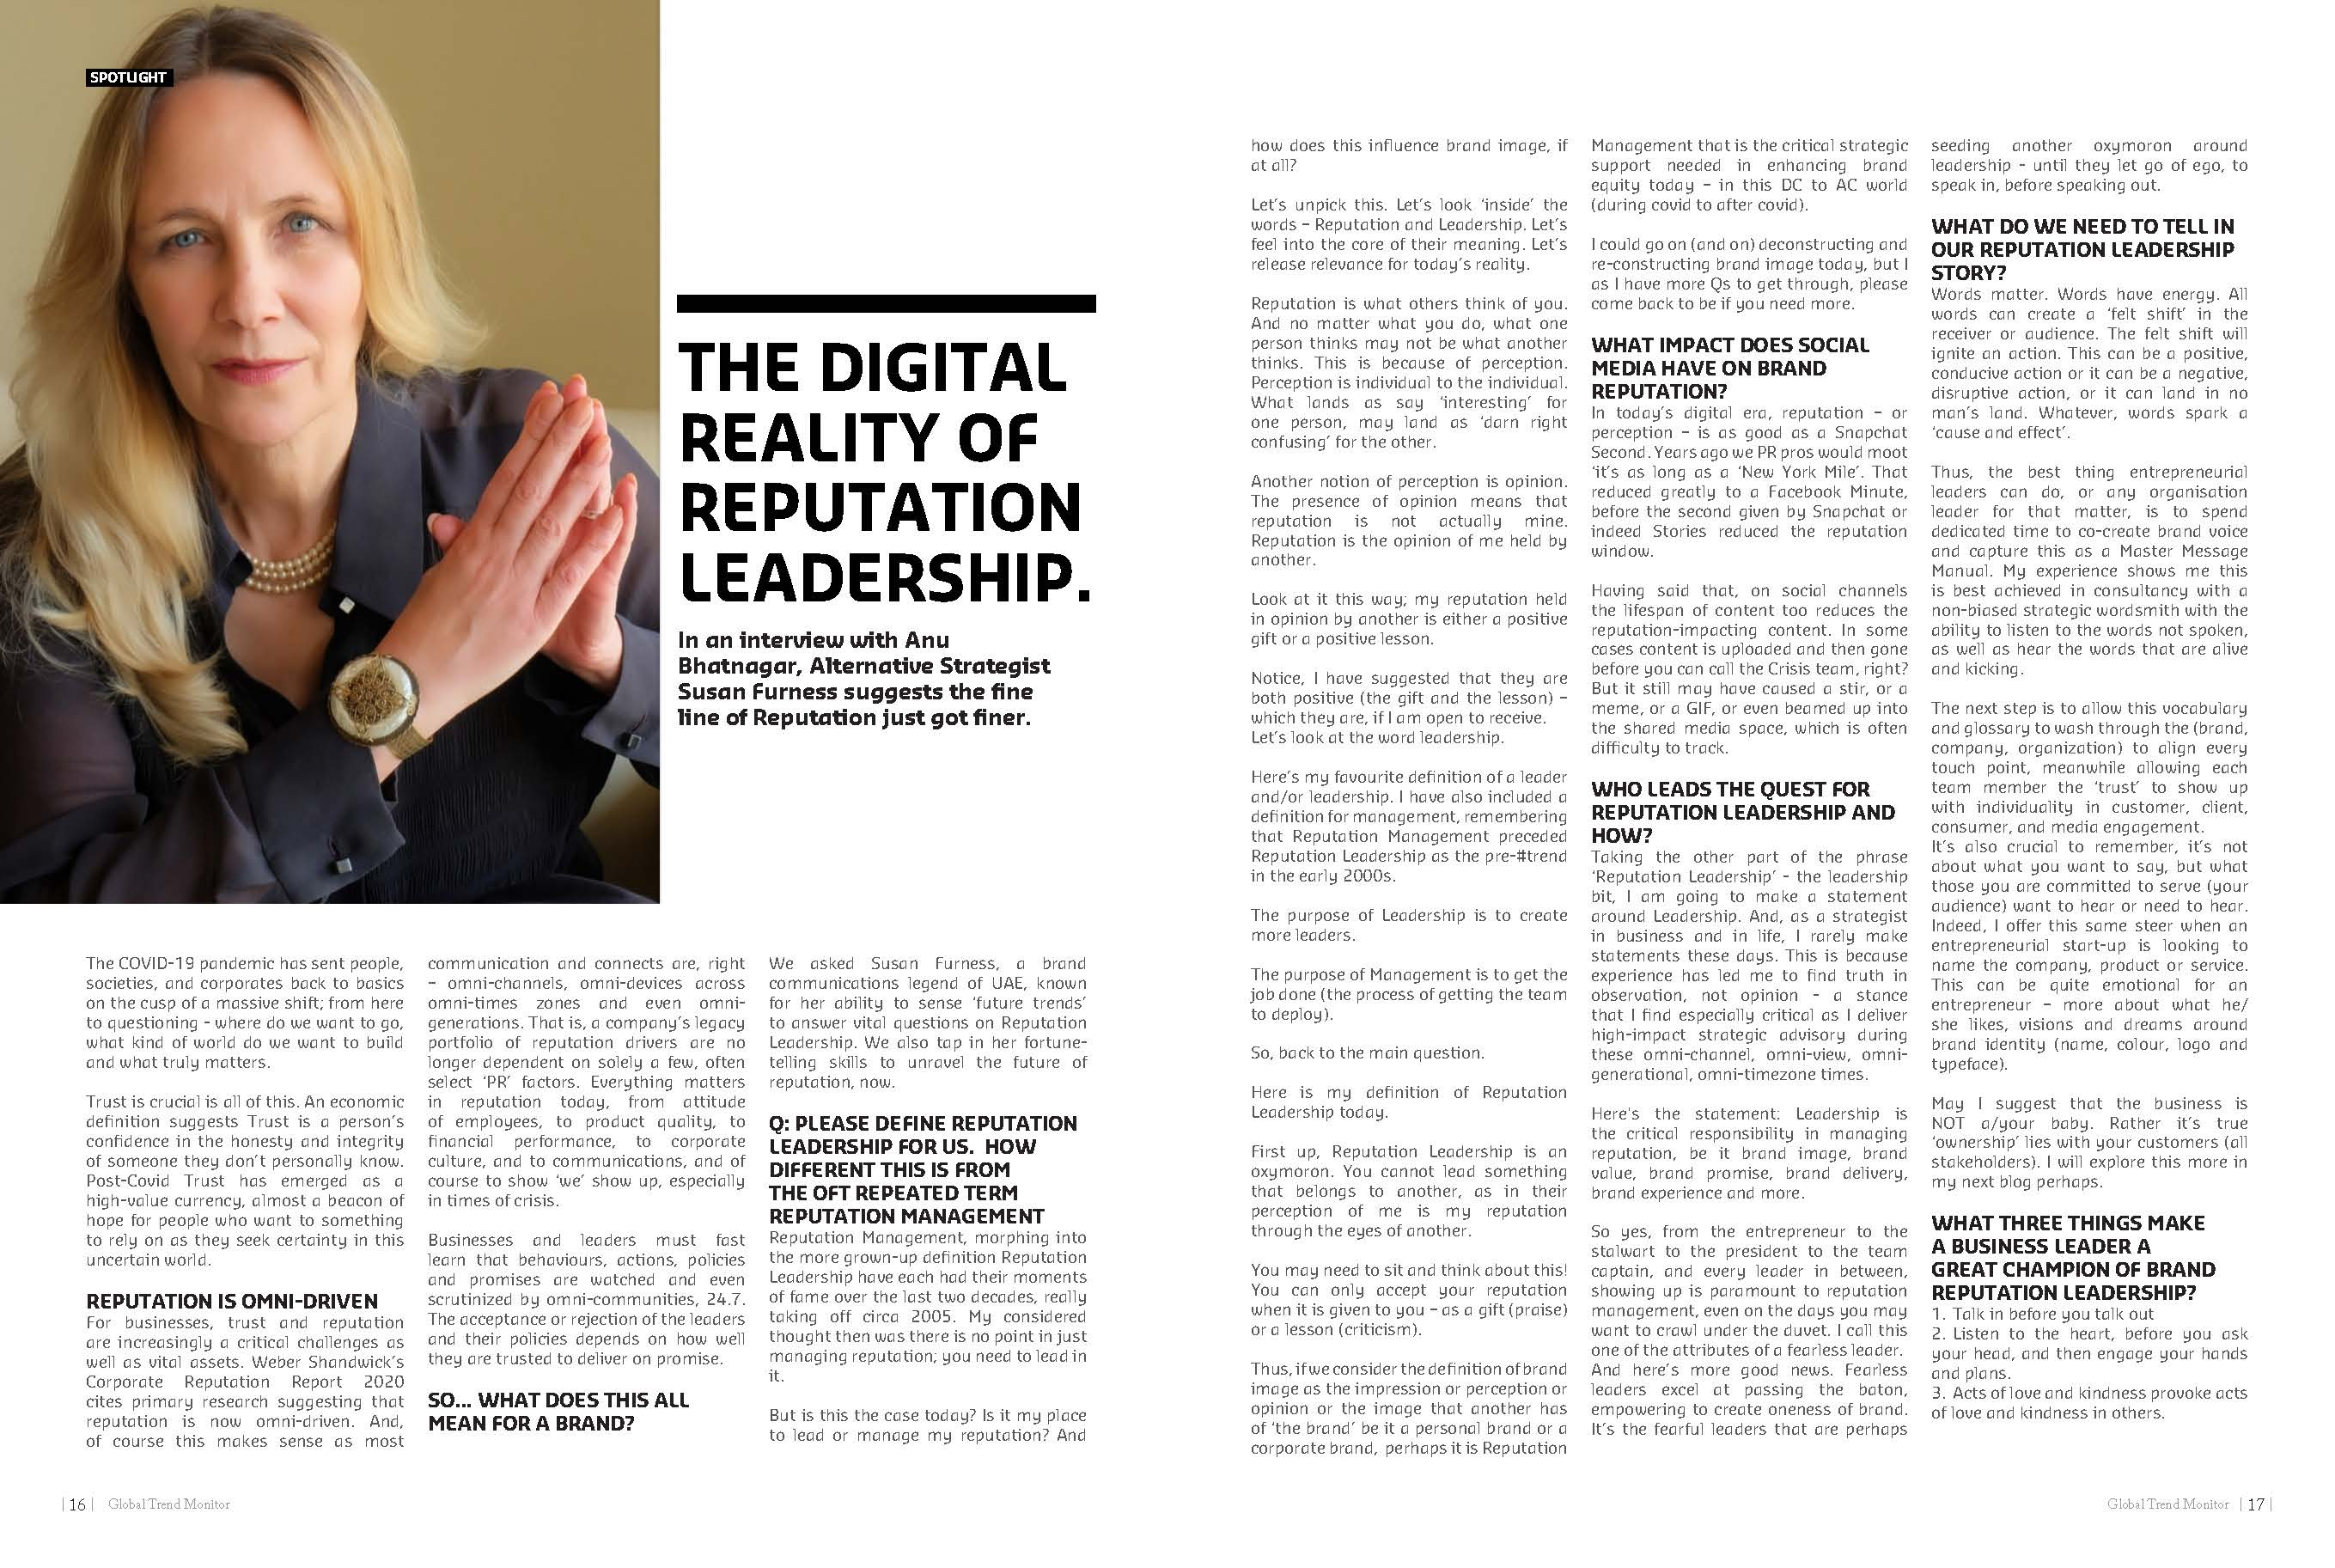 The Digital Reality of Reputation Leadership.